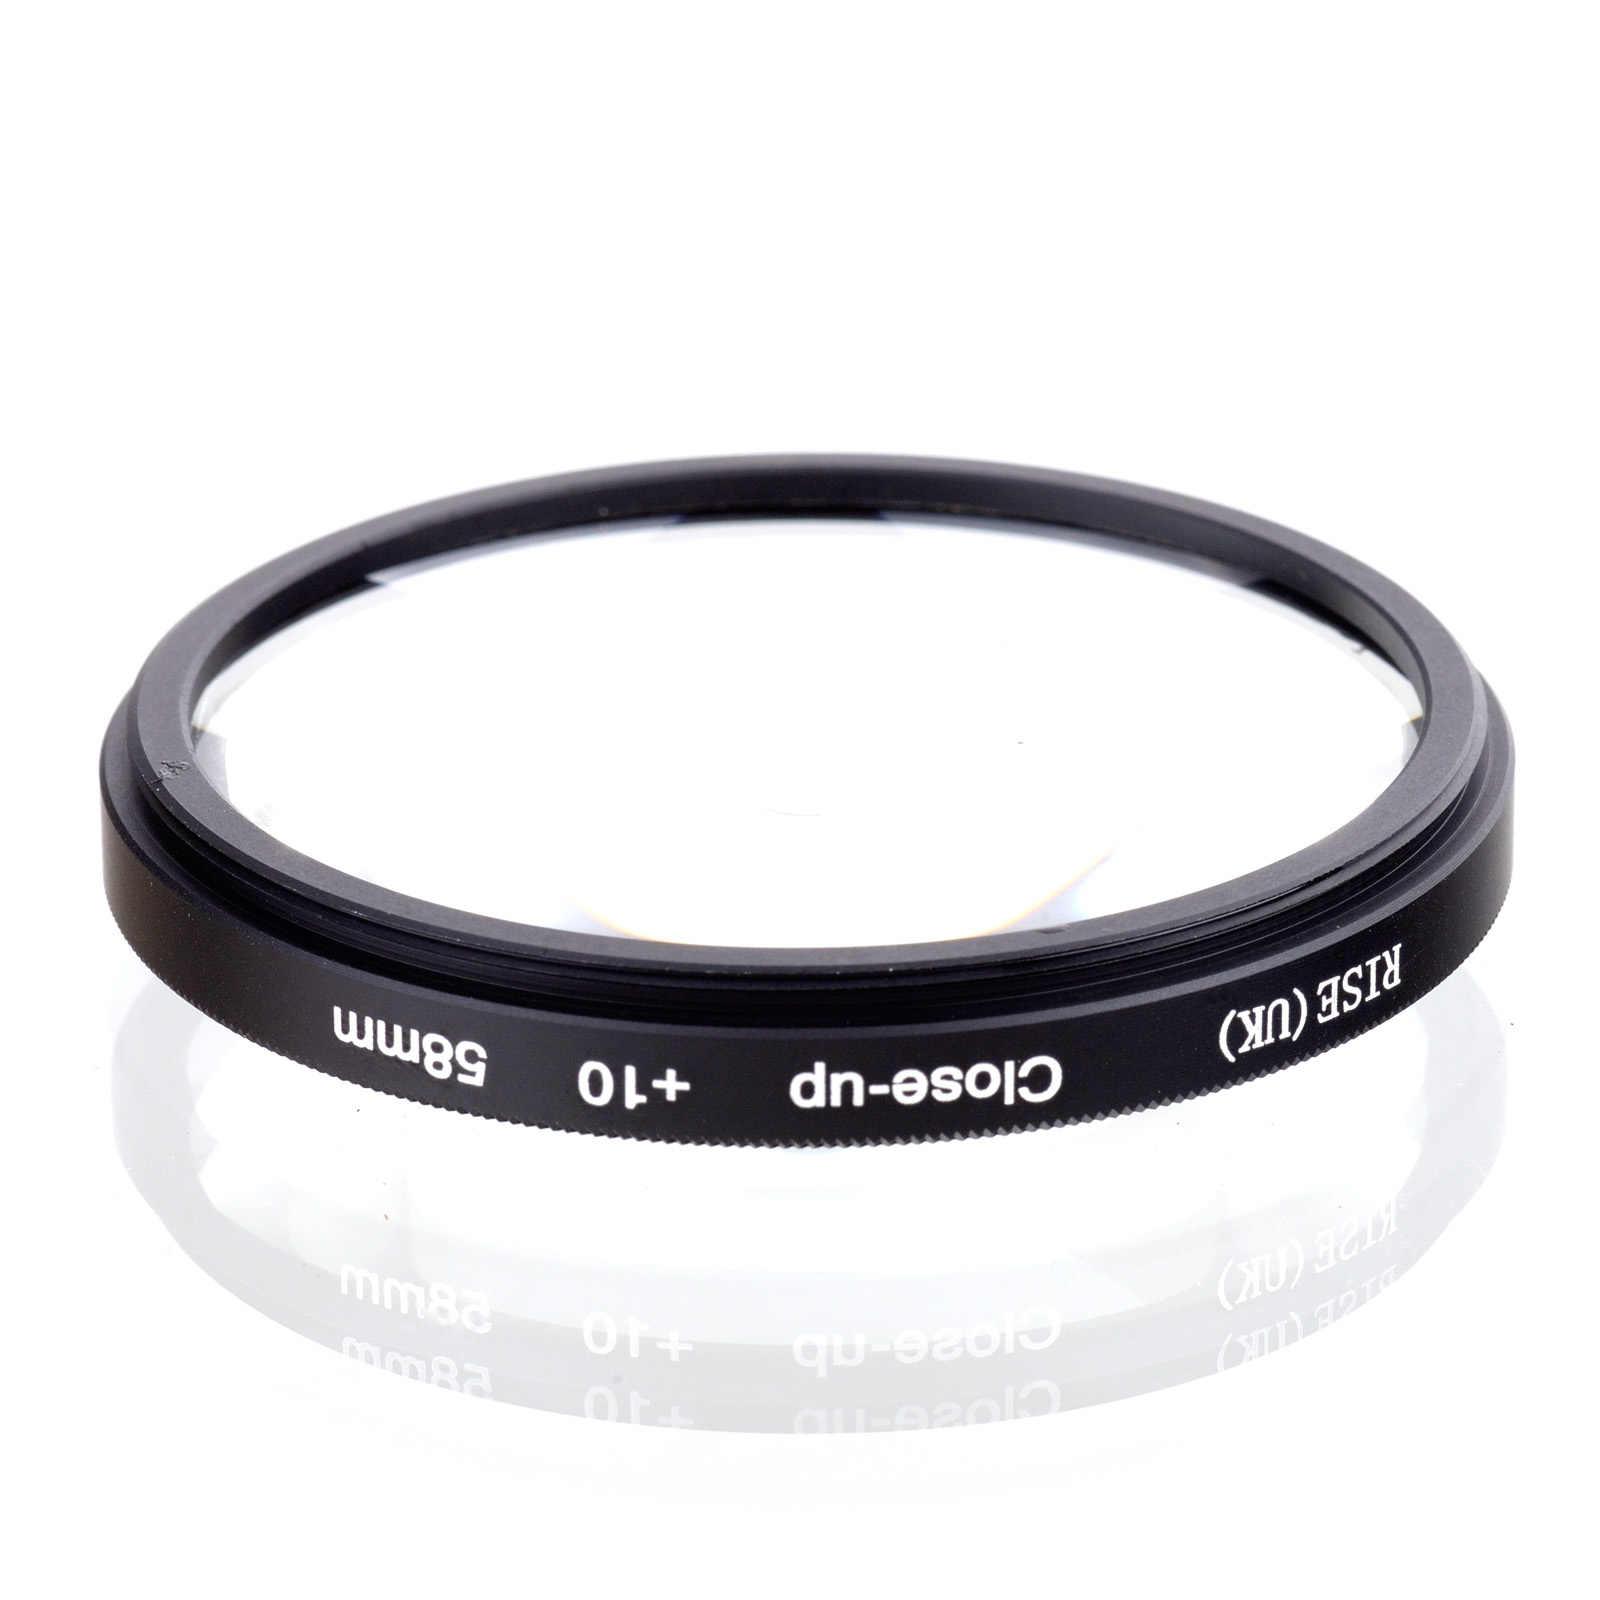 Naik (Inggris) 58 Mm Macro Close-Up + 10 Close Up Filter untuk DSLR Kamera Digital 58 Mm Lensa